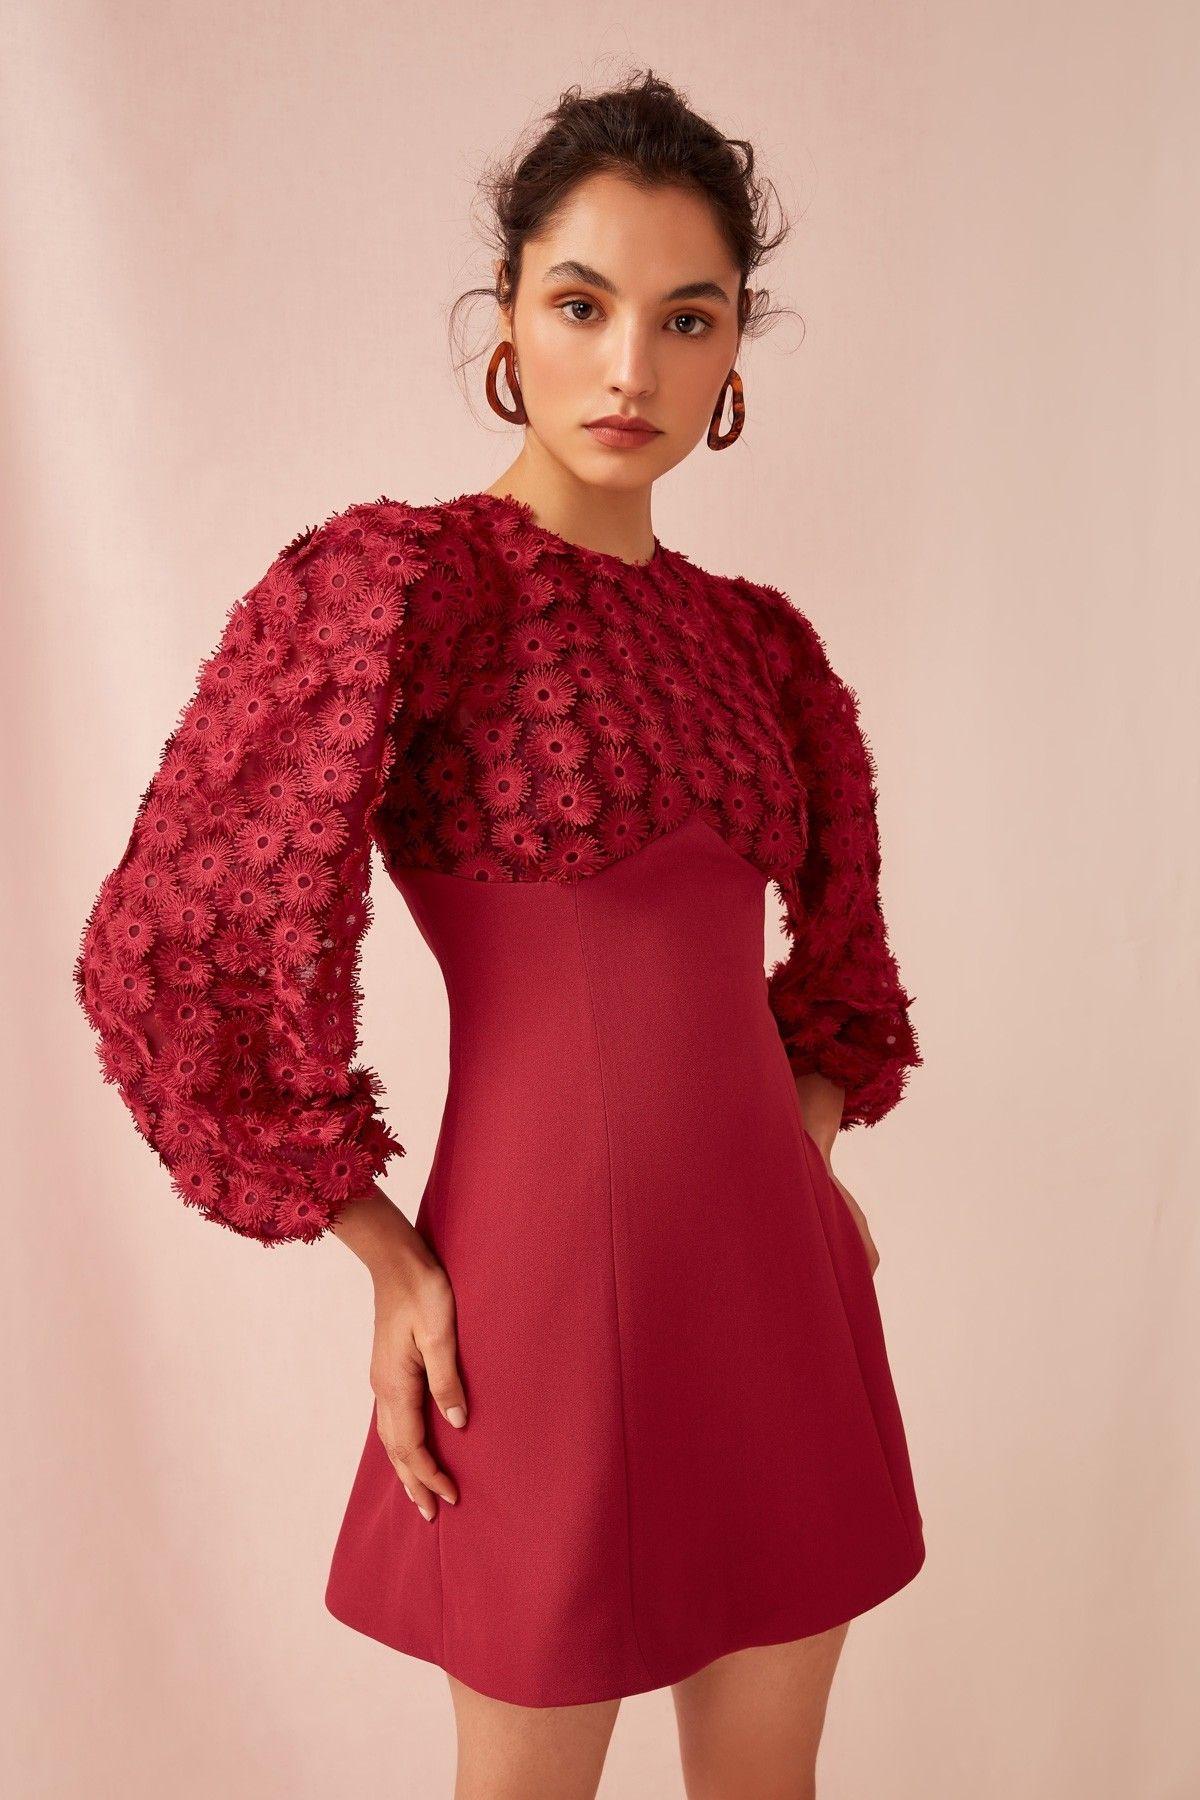 c585d72b3024 KEEPSAKE MIRRORS LONG SLEEVE DRESS raspberry in 2019